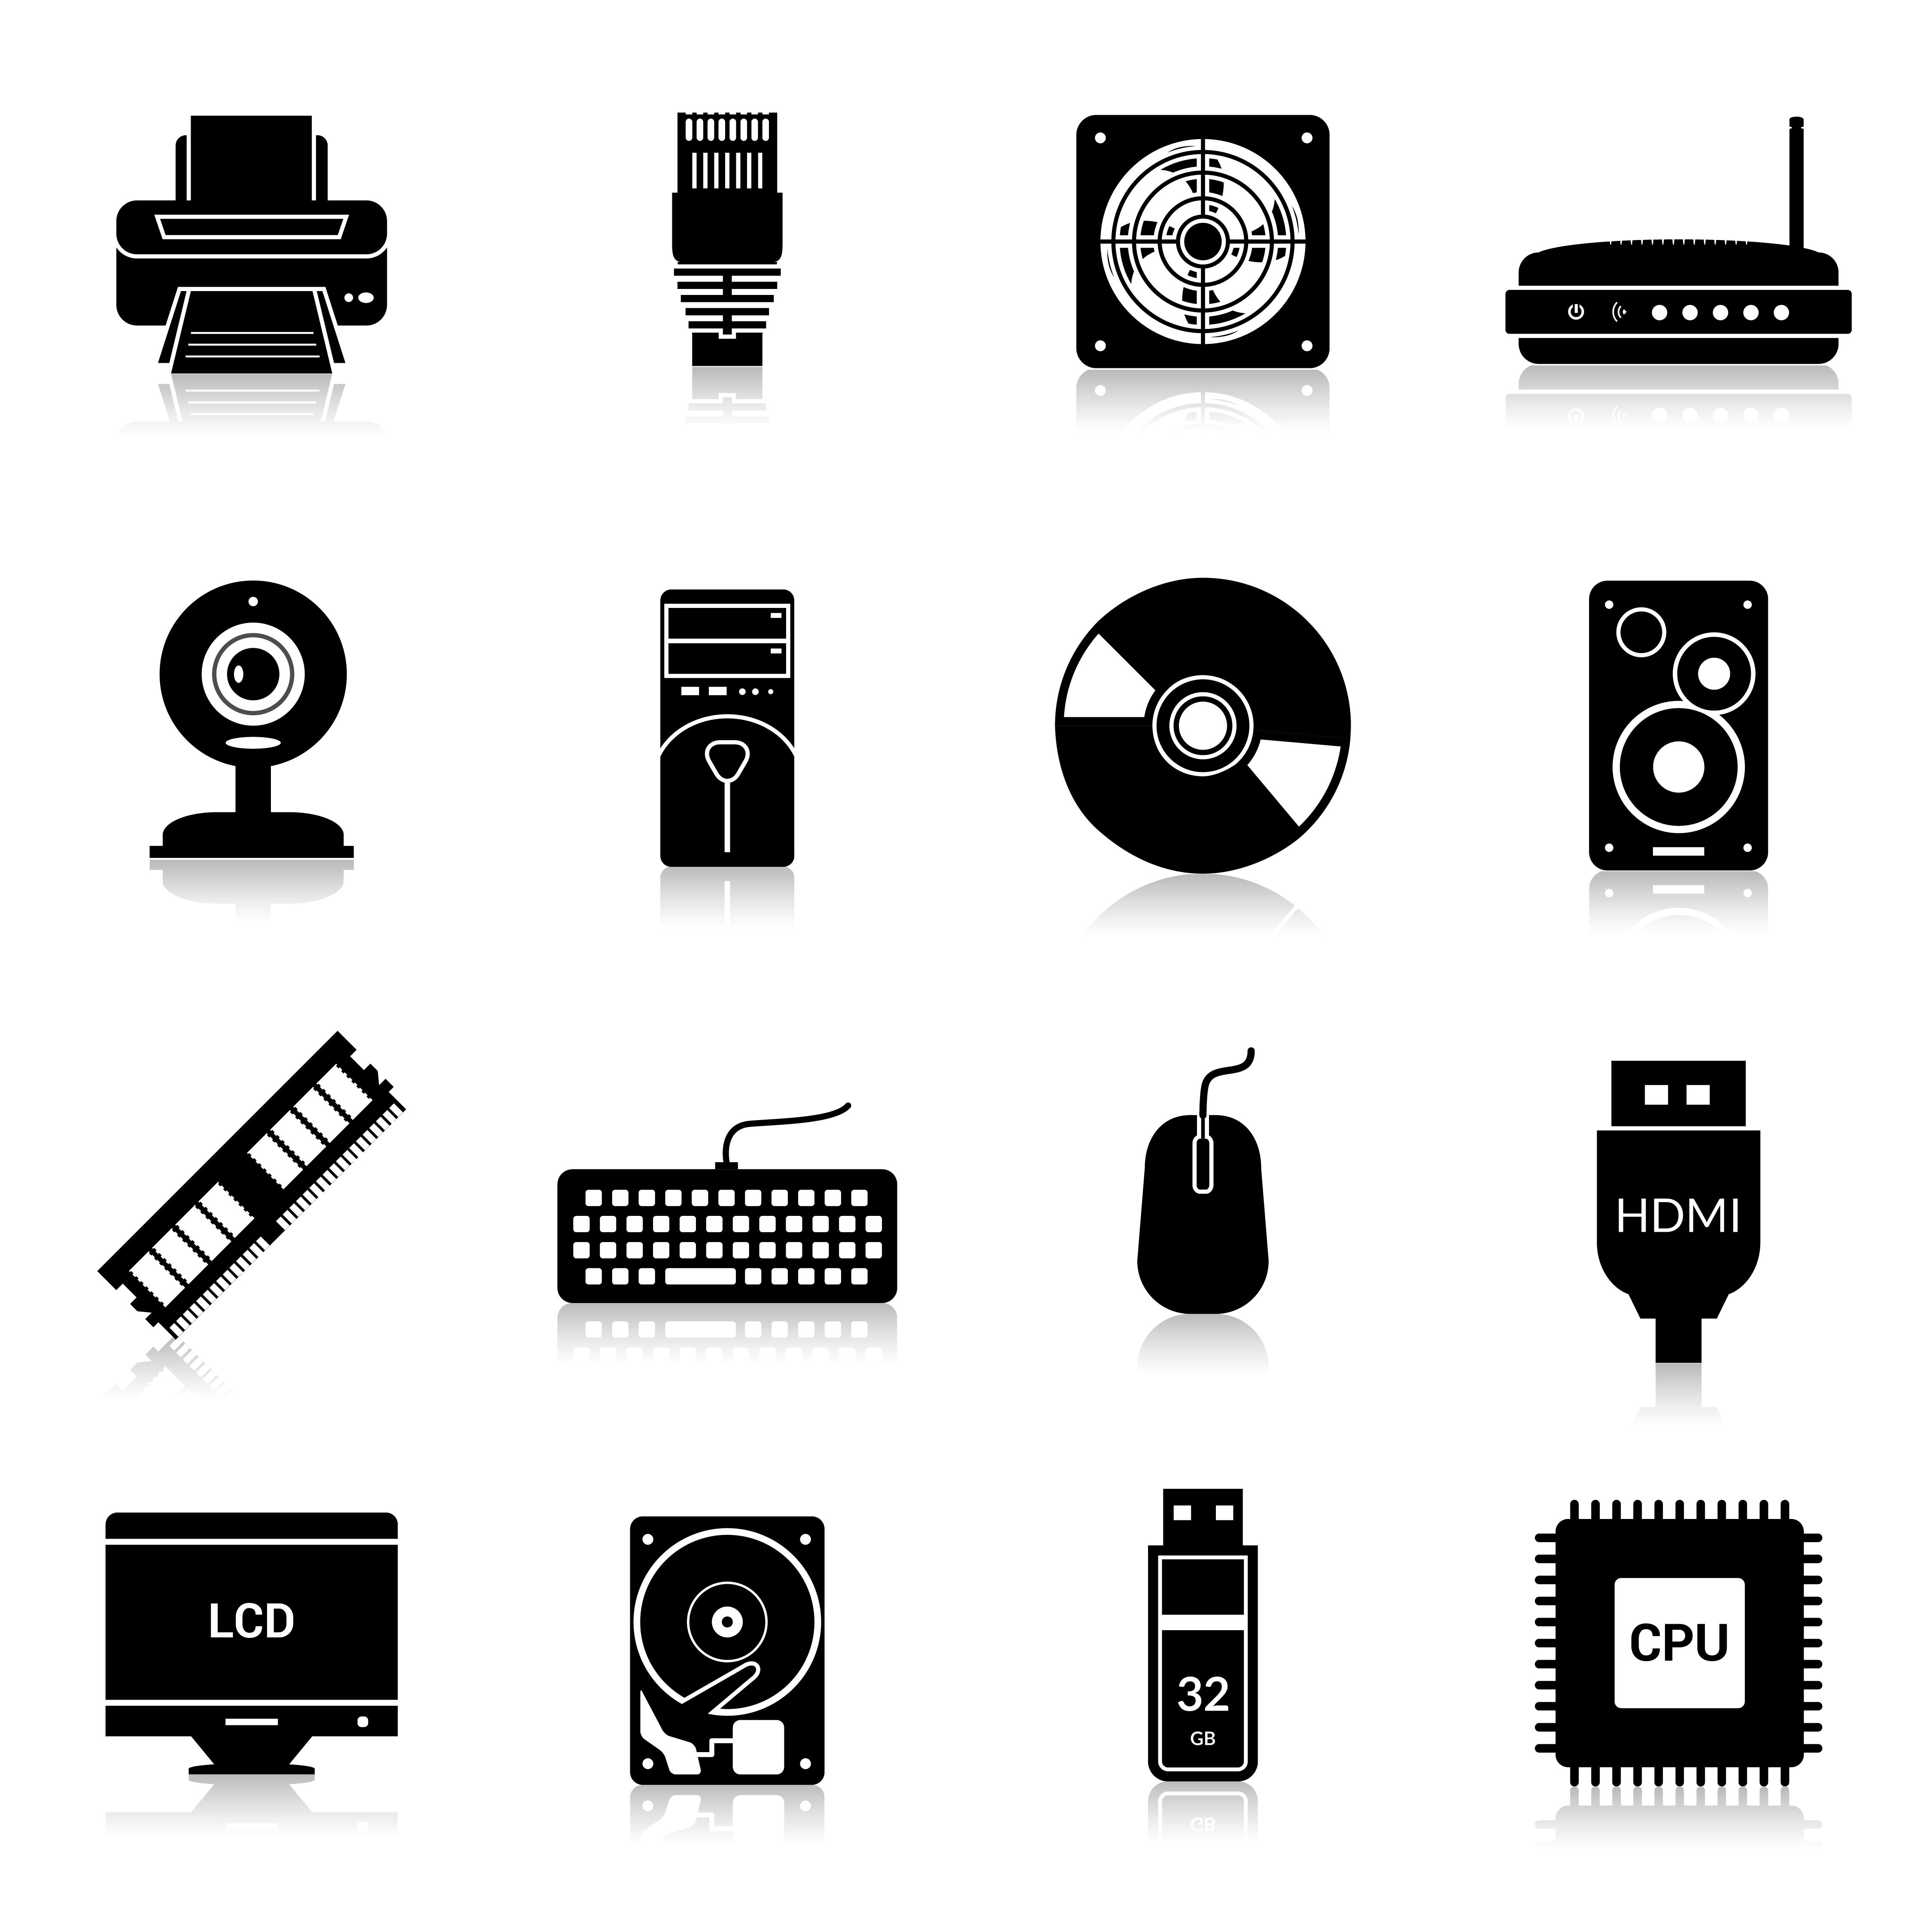 Computer Parts Icons Black